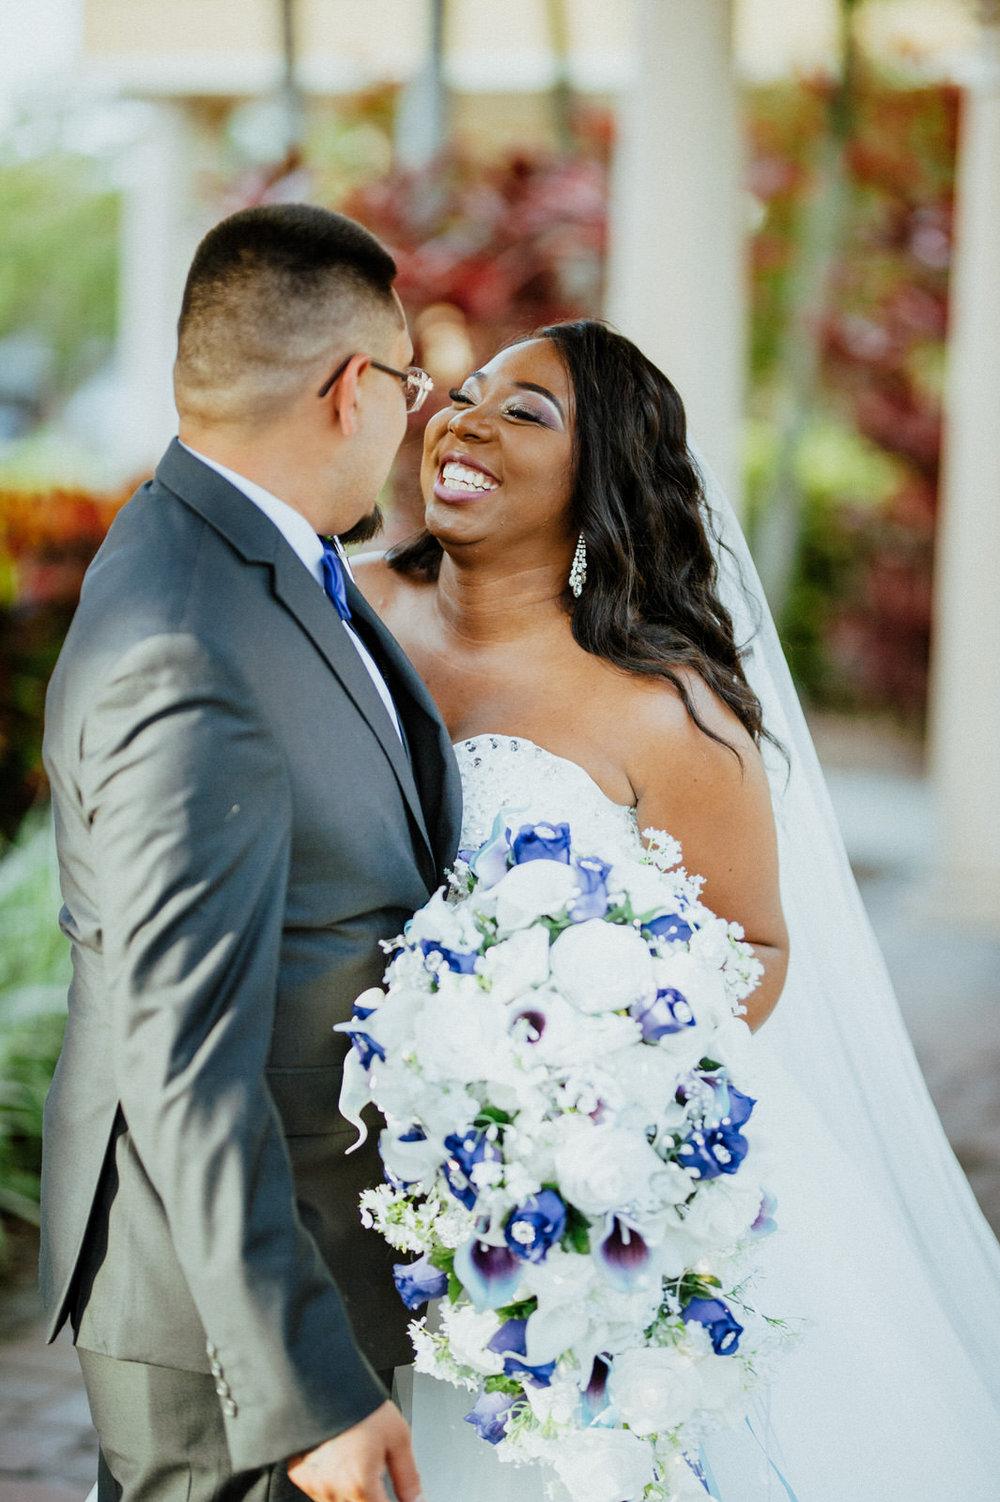 McNeile_Photography_Wedding_Tampa106-1.jpg